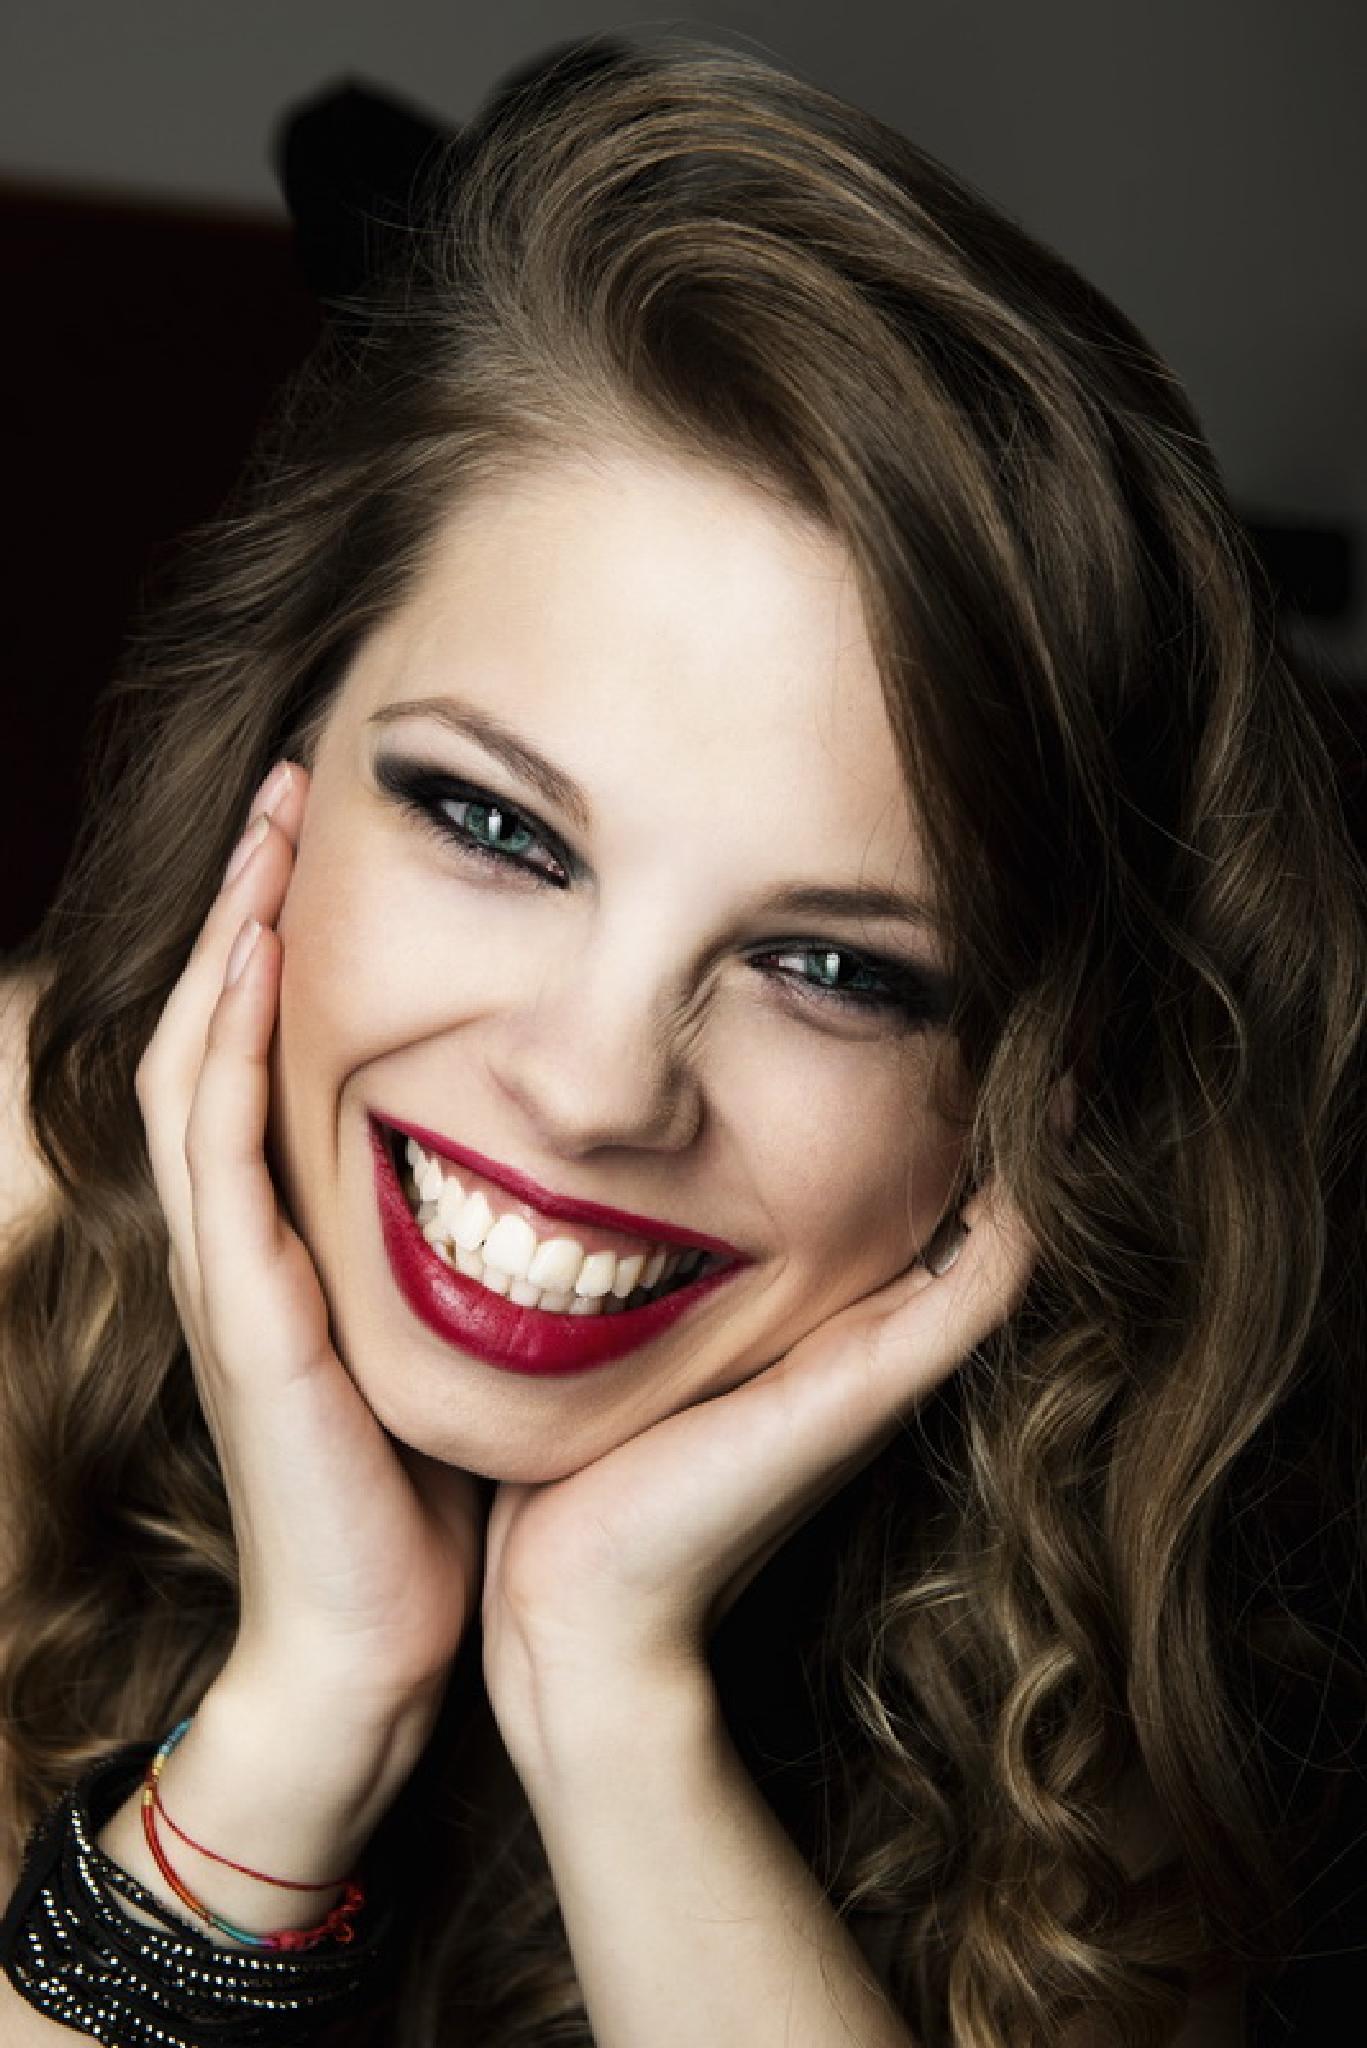 Smile by Andrea Bernardi